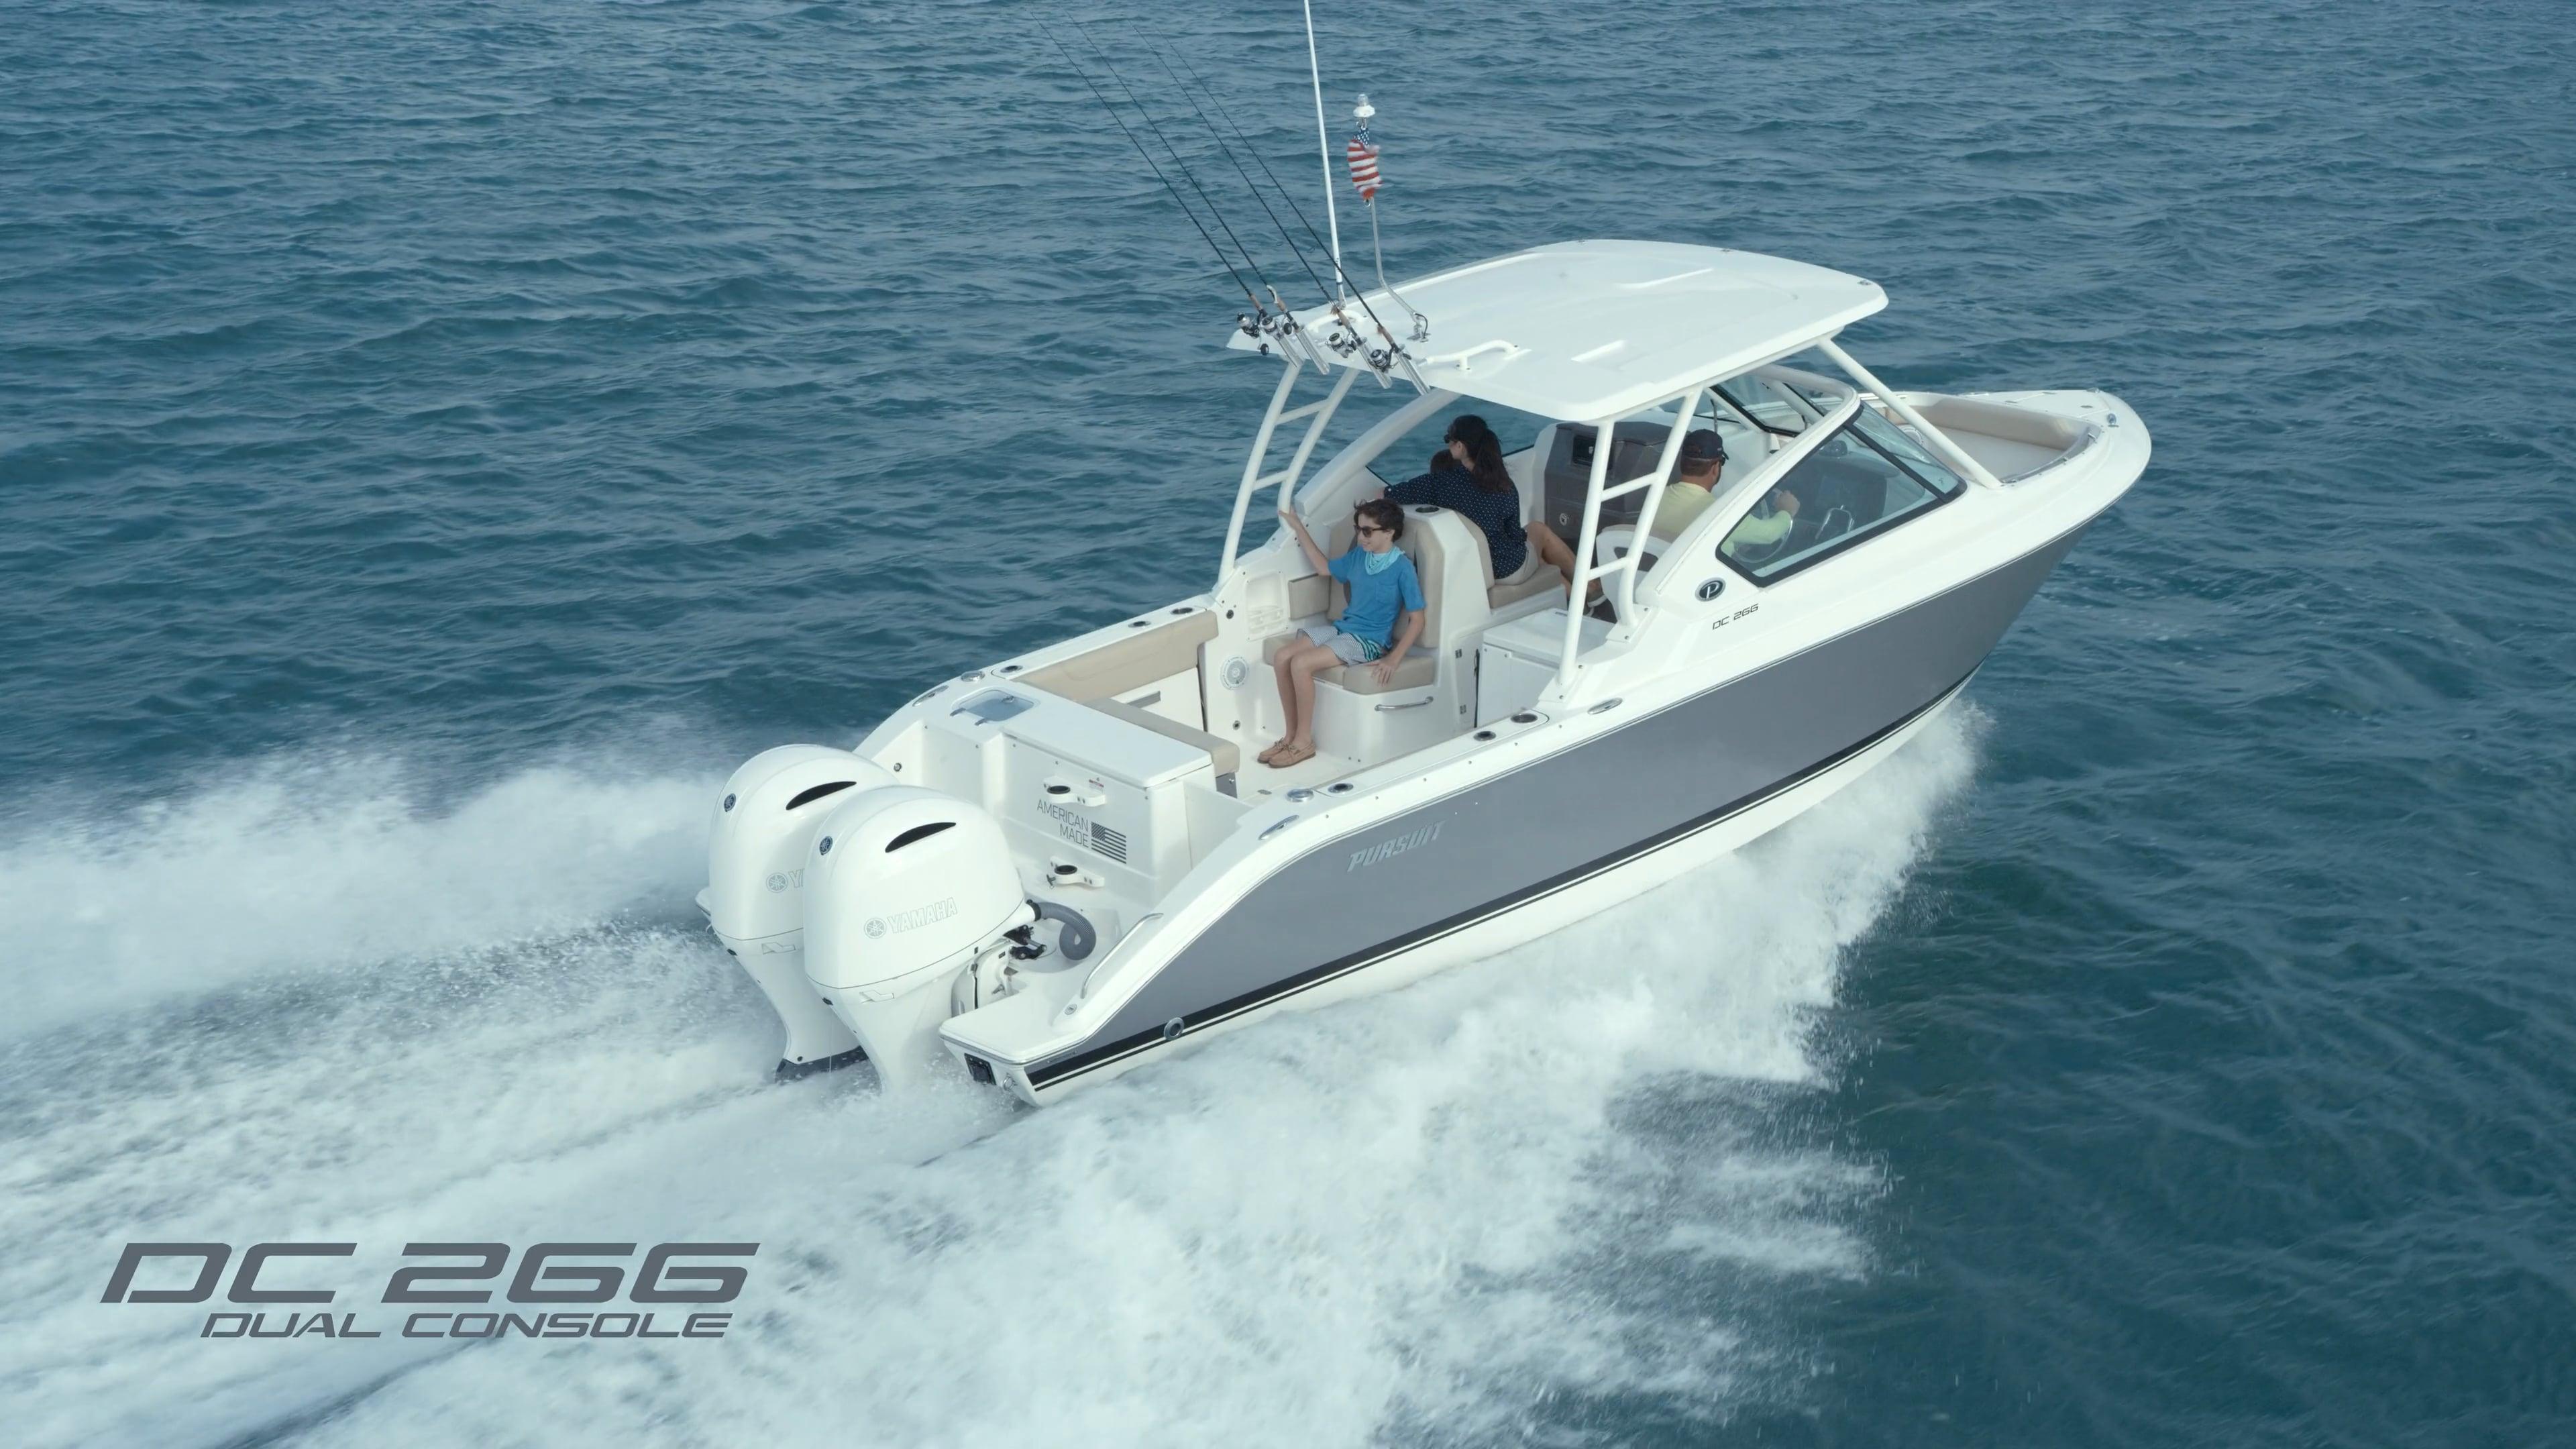 Pursuit Boats DC 266. Watch video now.